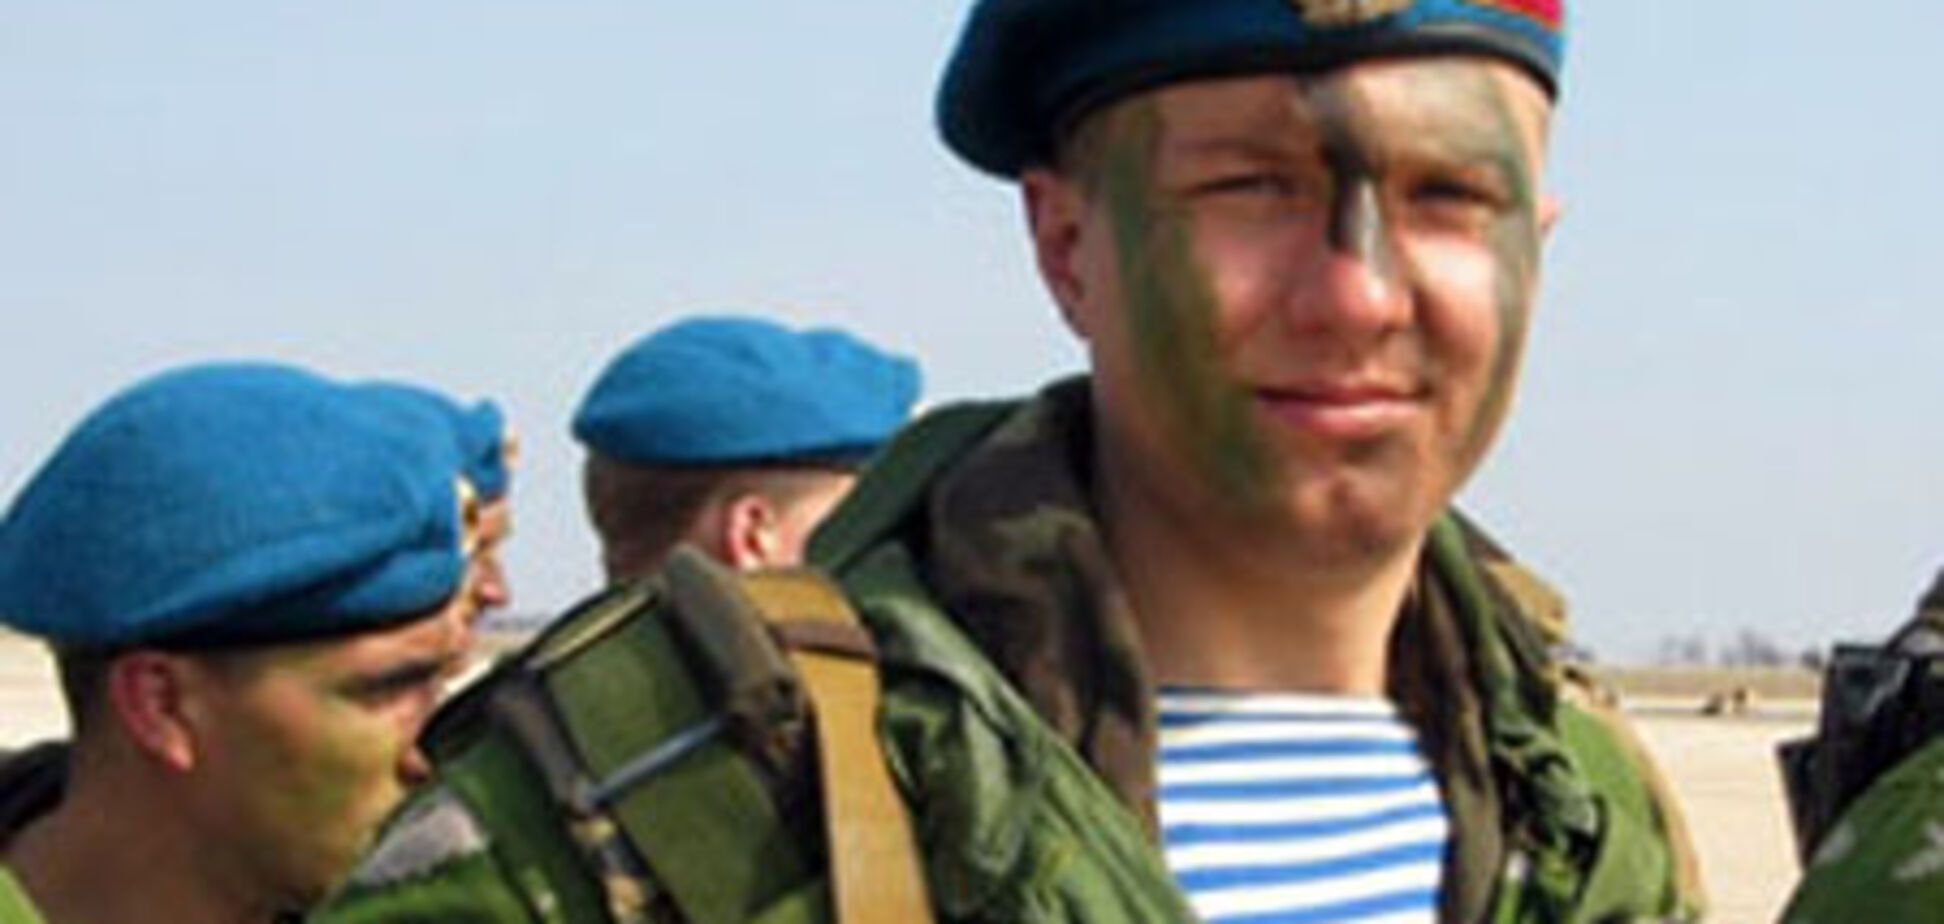 В Полтаве откосить от армии можно за 900 гривен